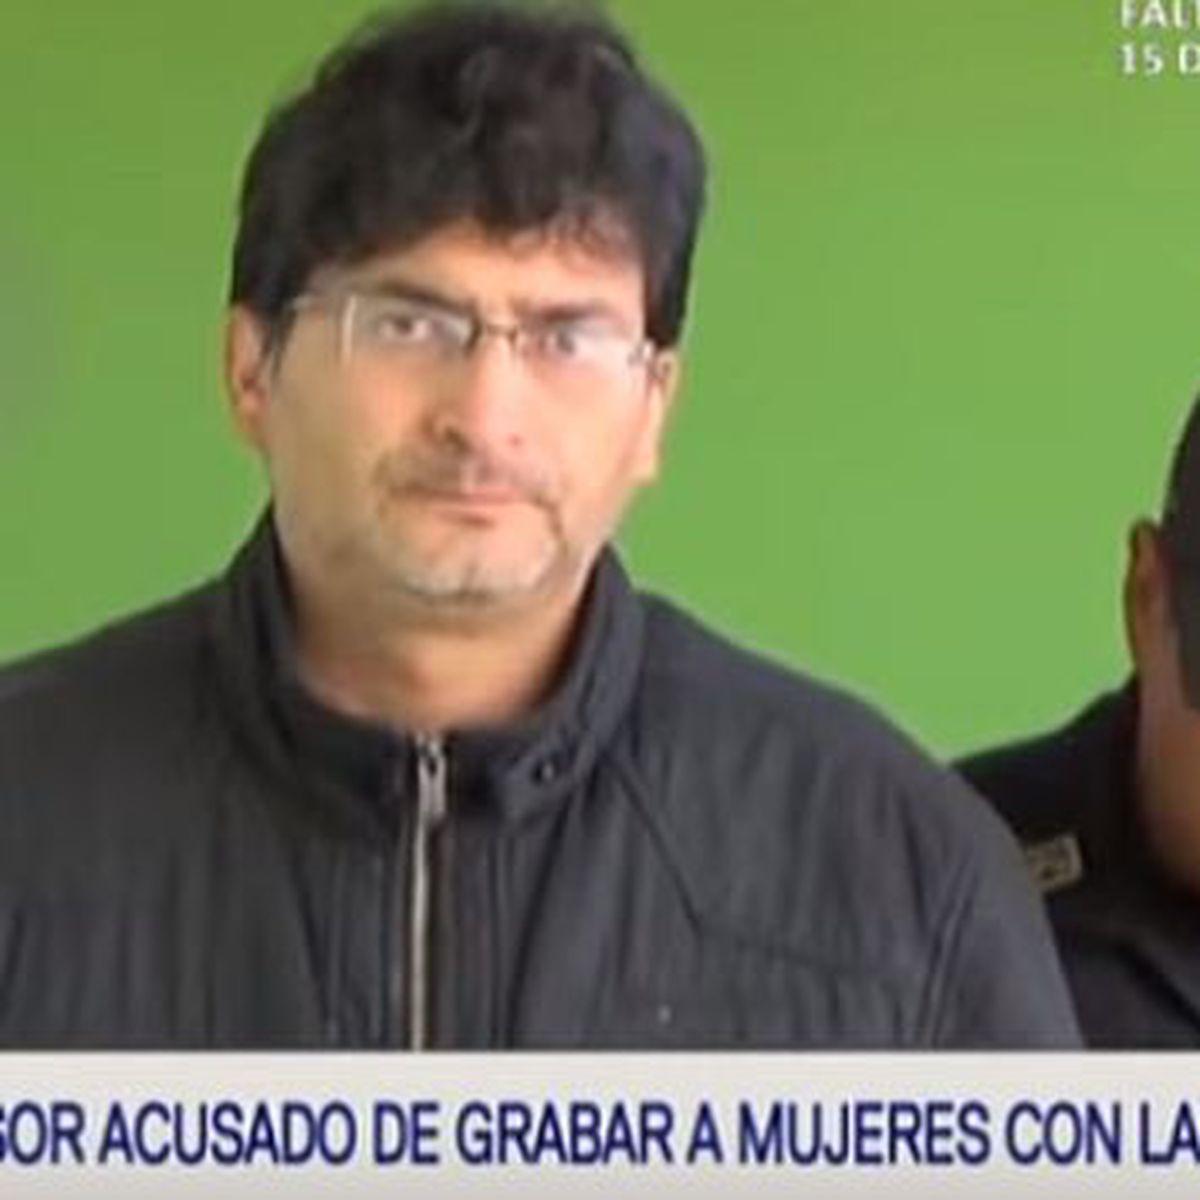 Camara Oculta Mujeres cajamarca: denuncian a profesor por grabar partes íntimas de